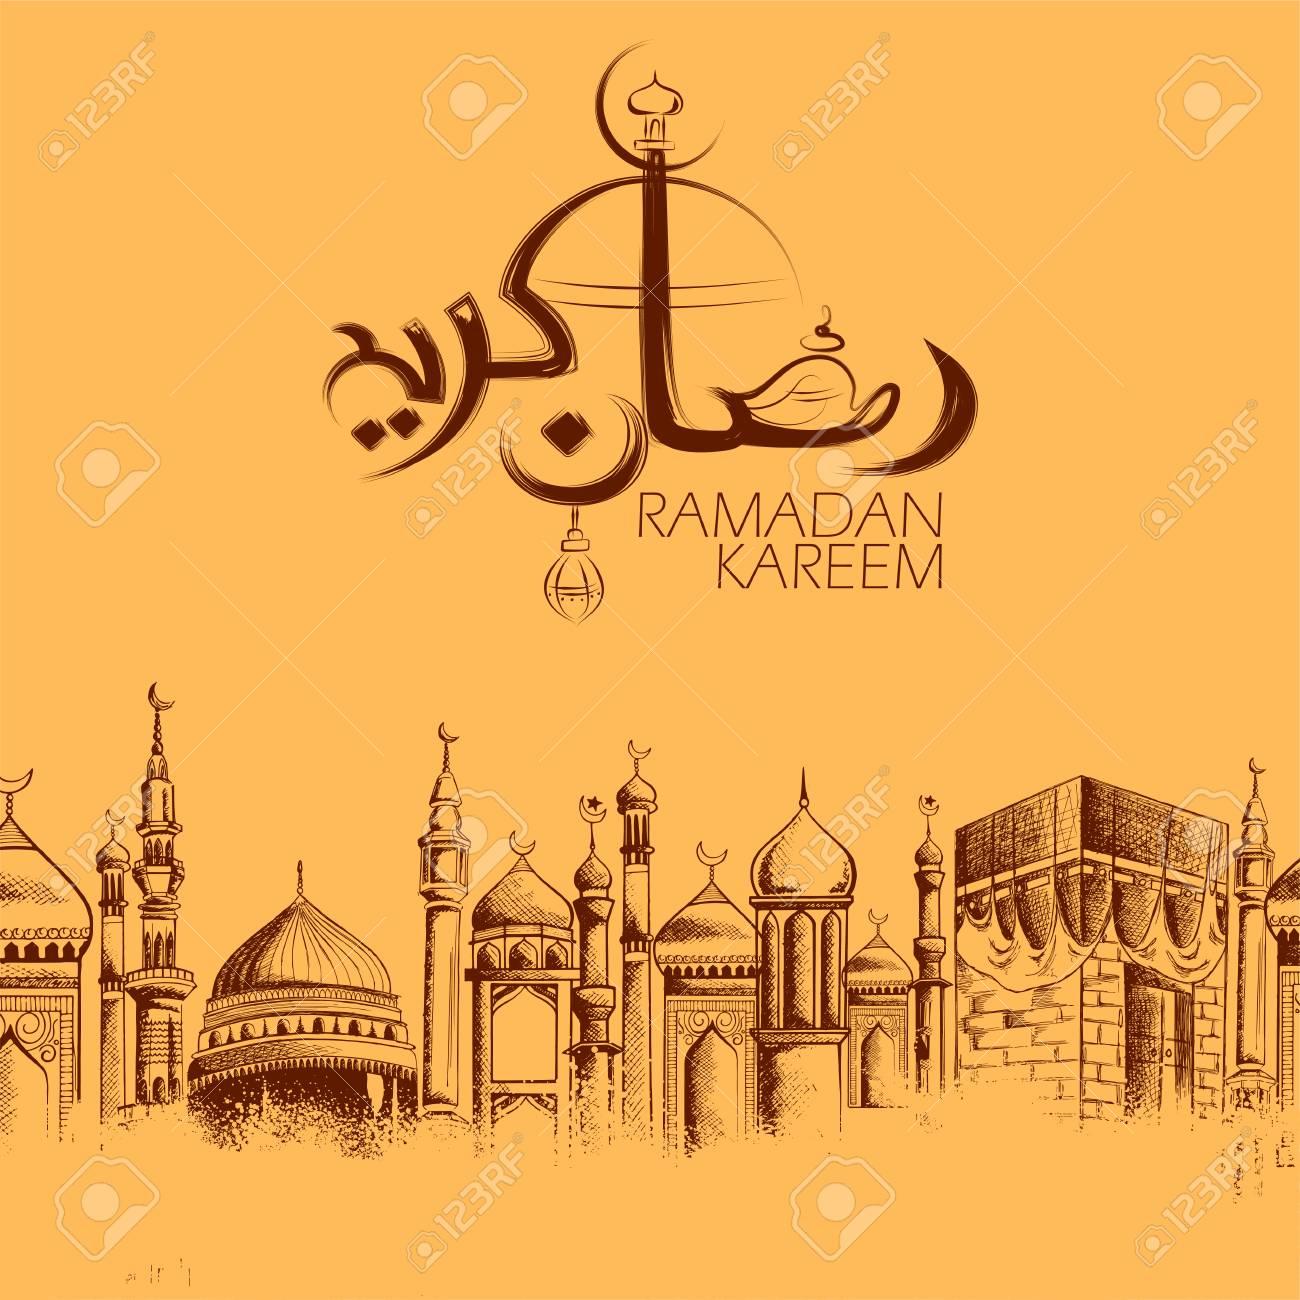 Illustration Of Ramadan Kareem Generous Ramadan Greetings In